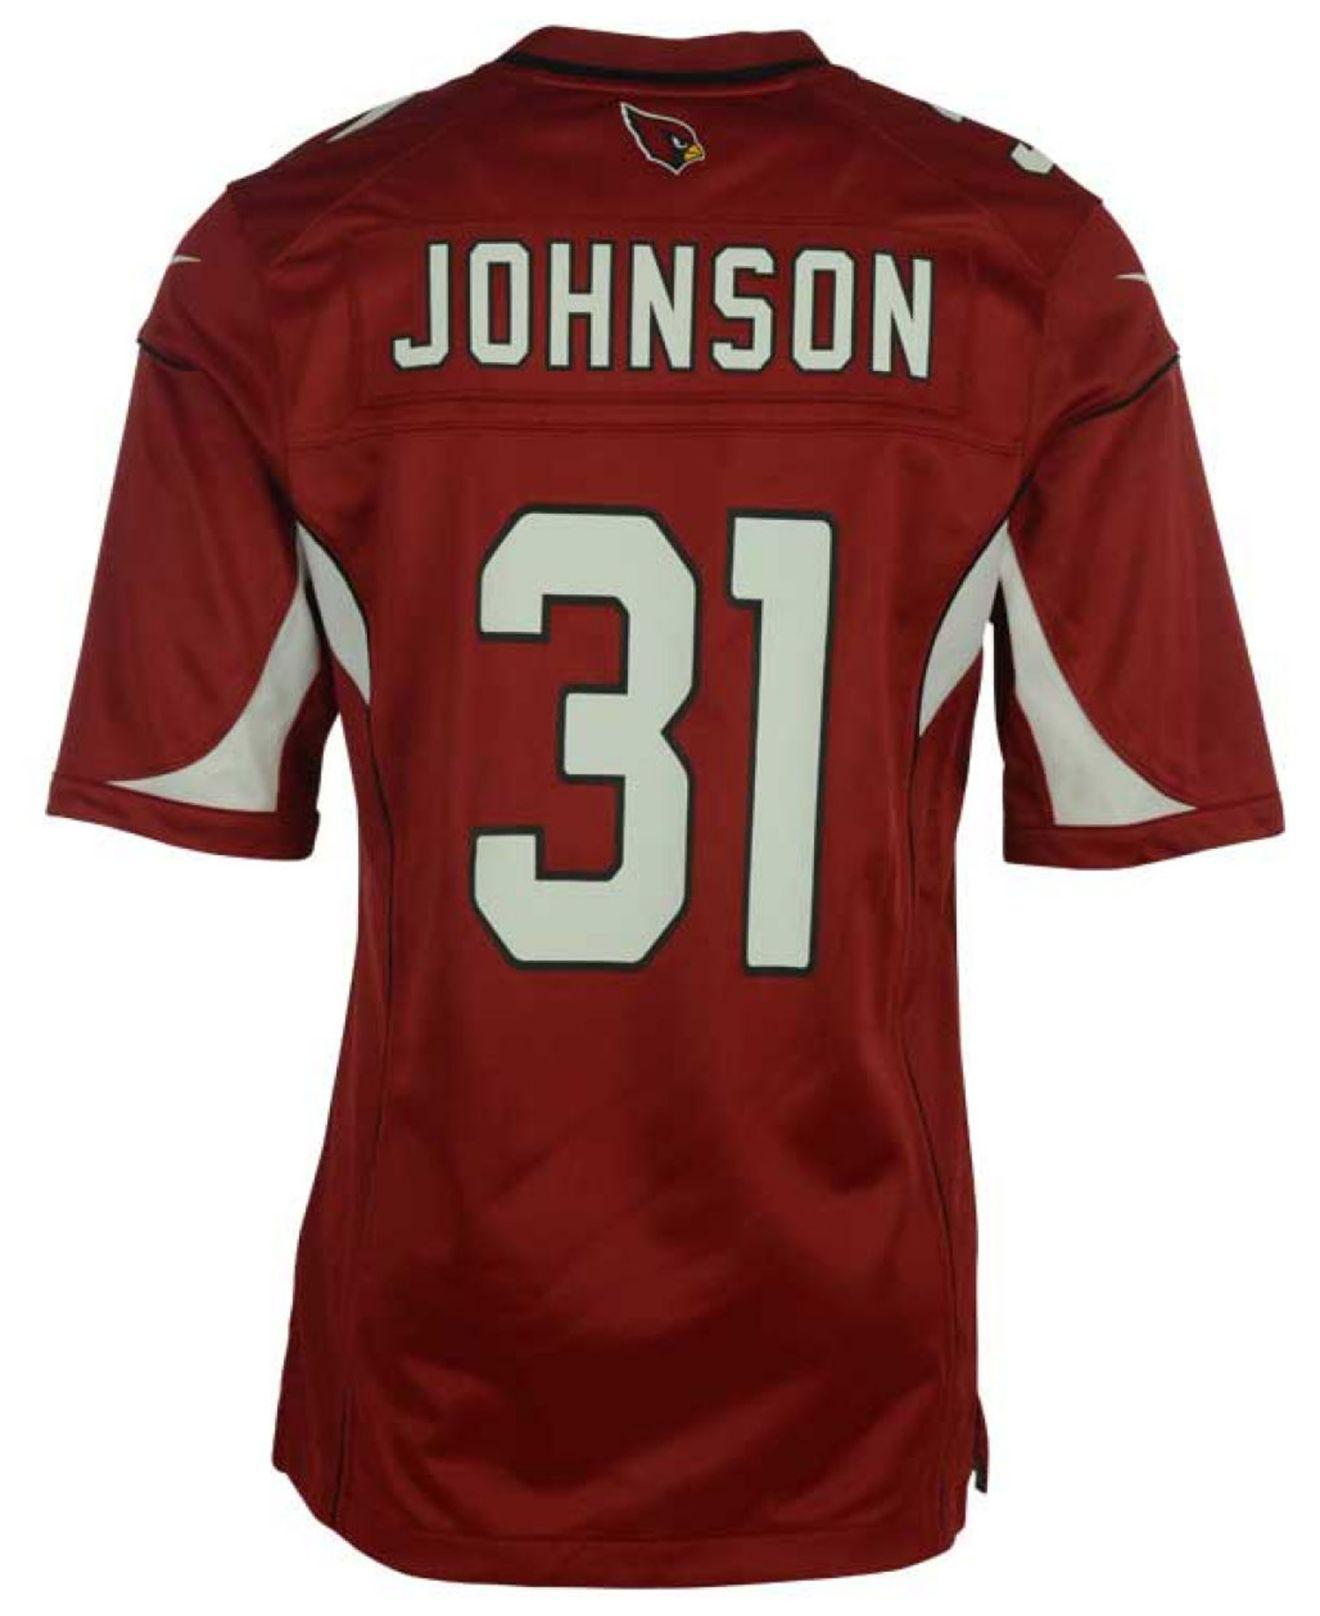 a81790543c0 Lyst - Nike Men s David Johnson Arizona Cardinals Game Jersey in Red ...